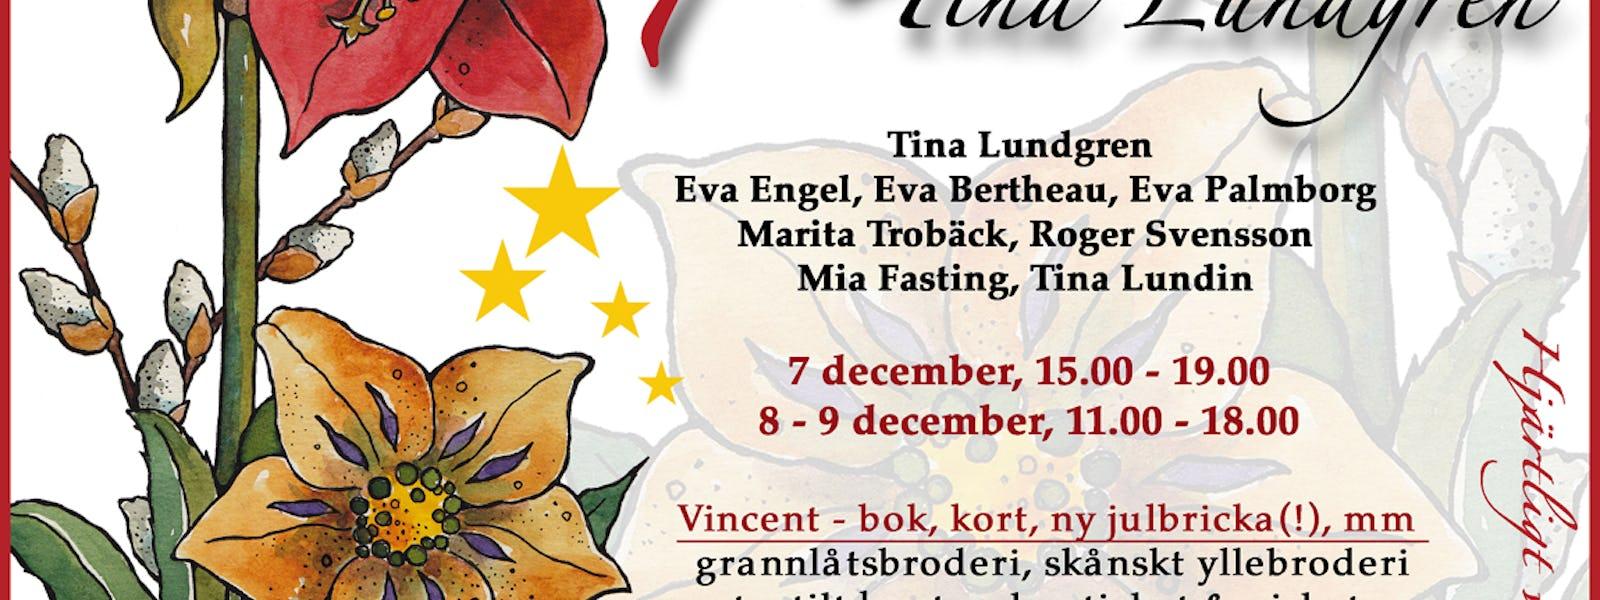 Bild - Advent hos Tina Lundgren